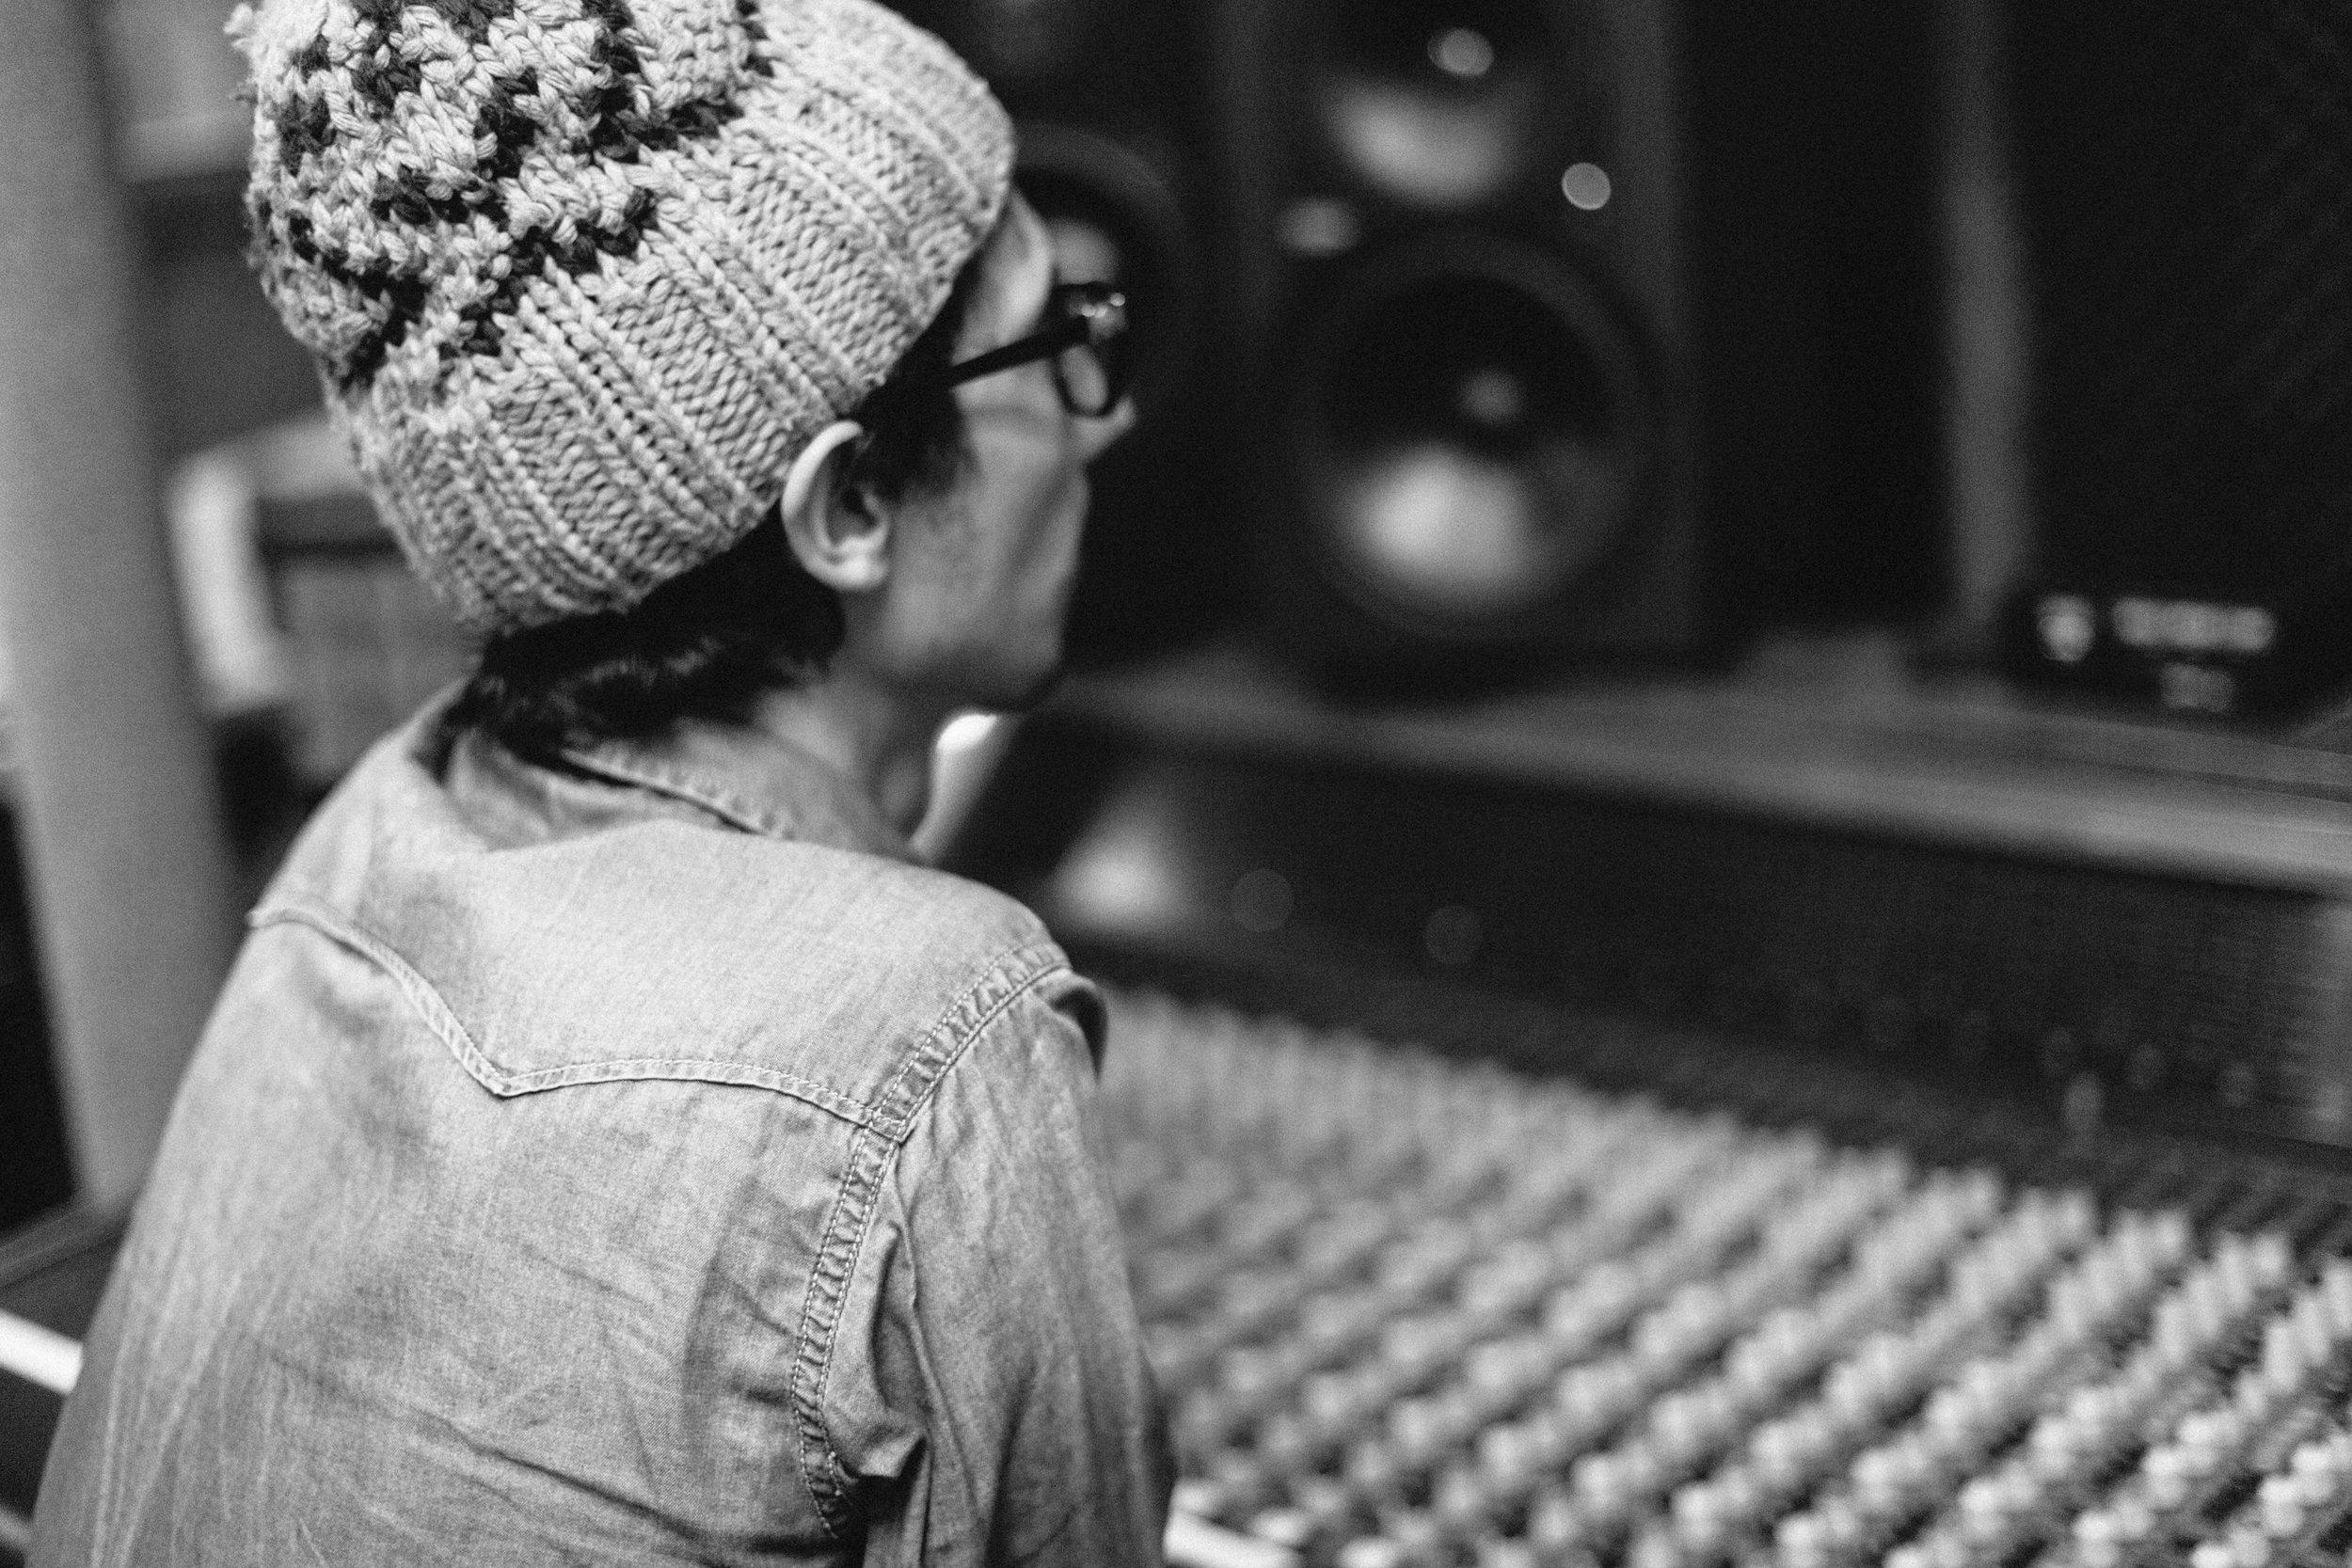 Ivan Basuri, Sound Technician